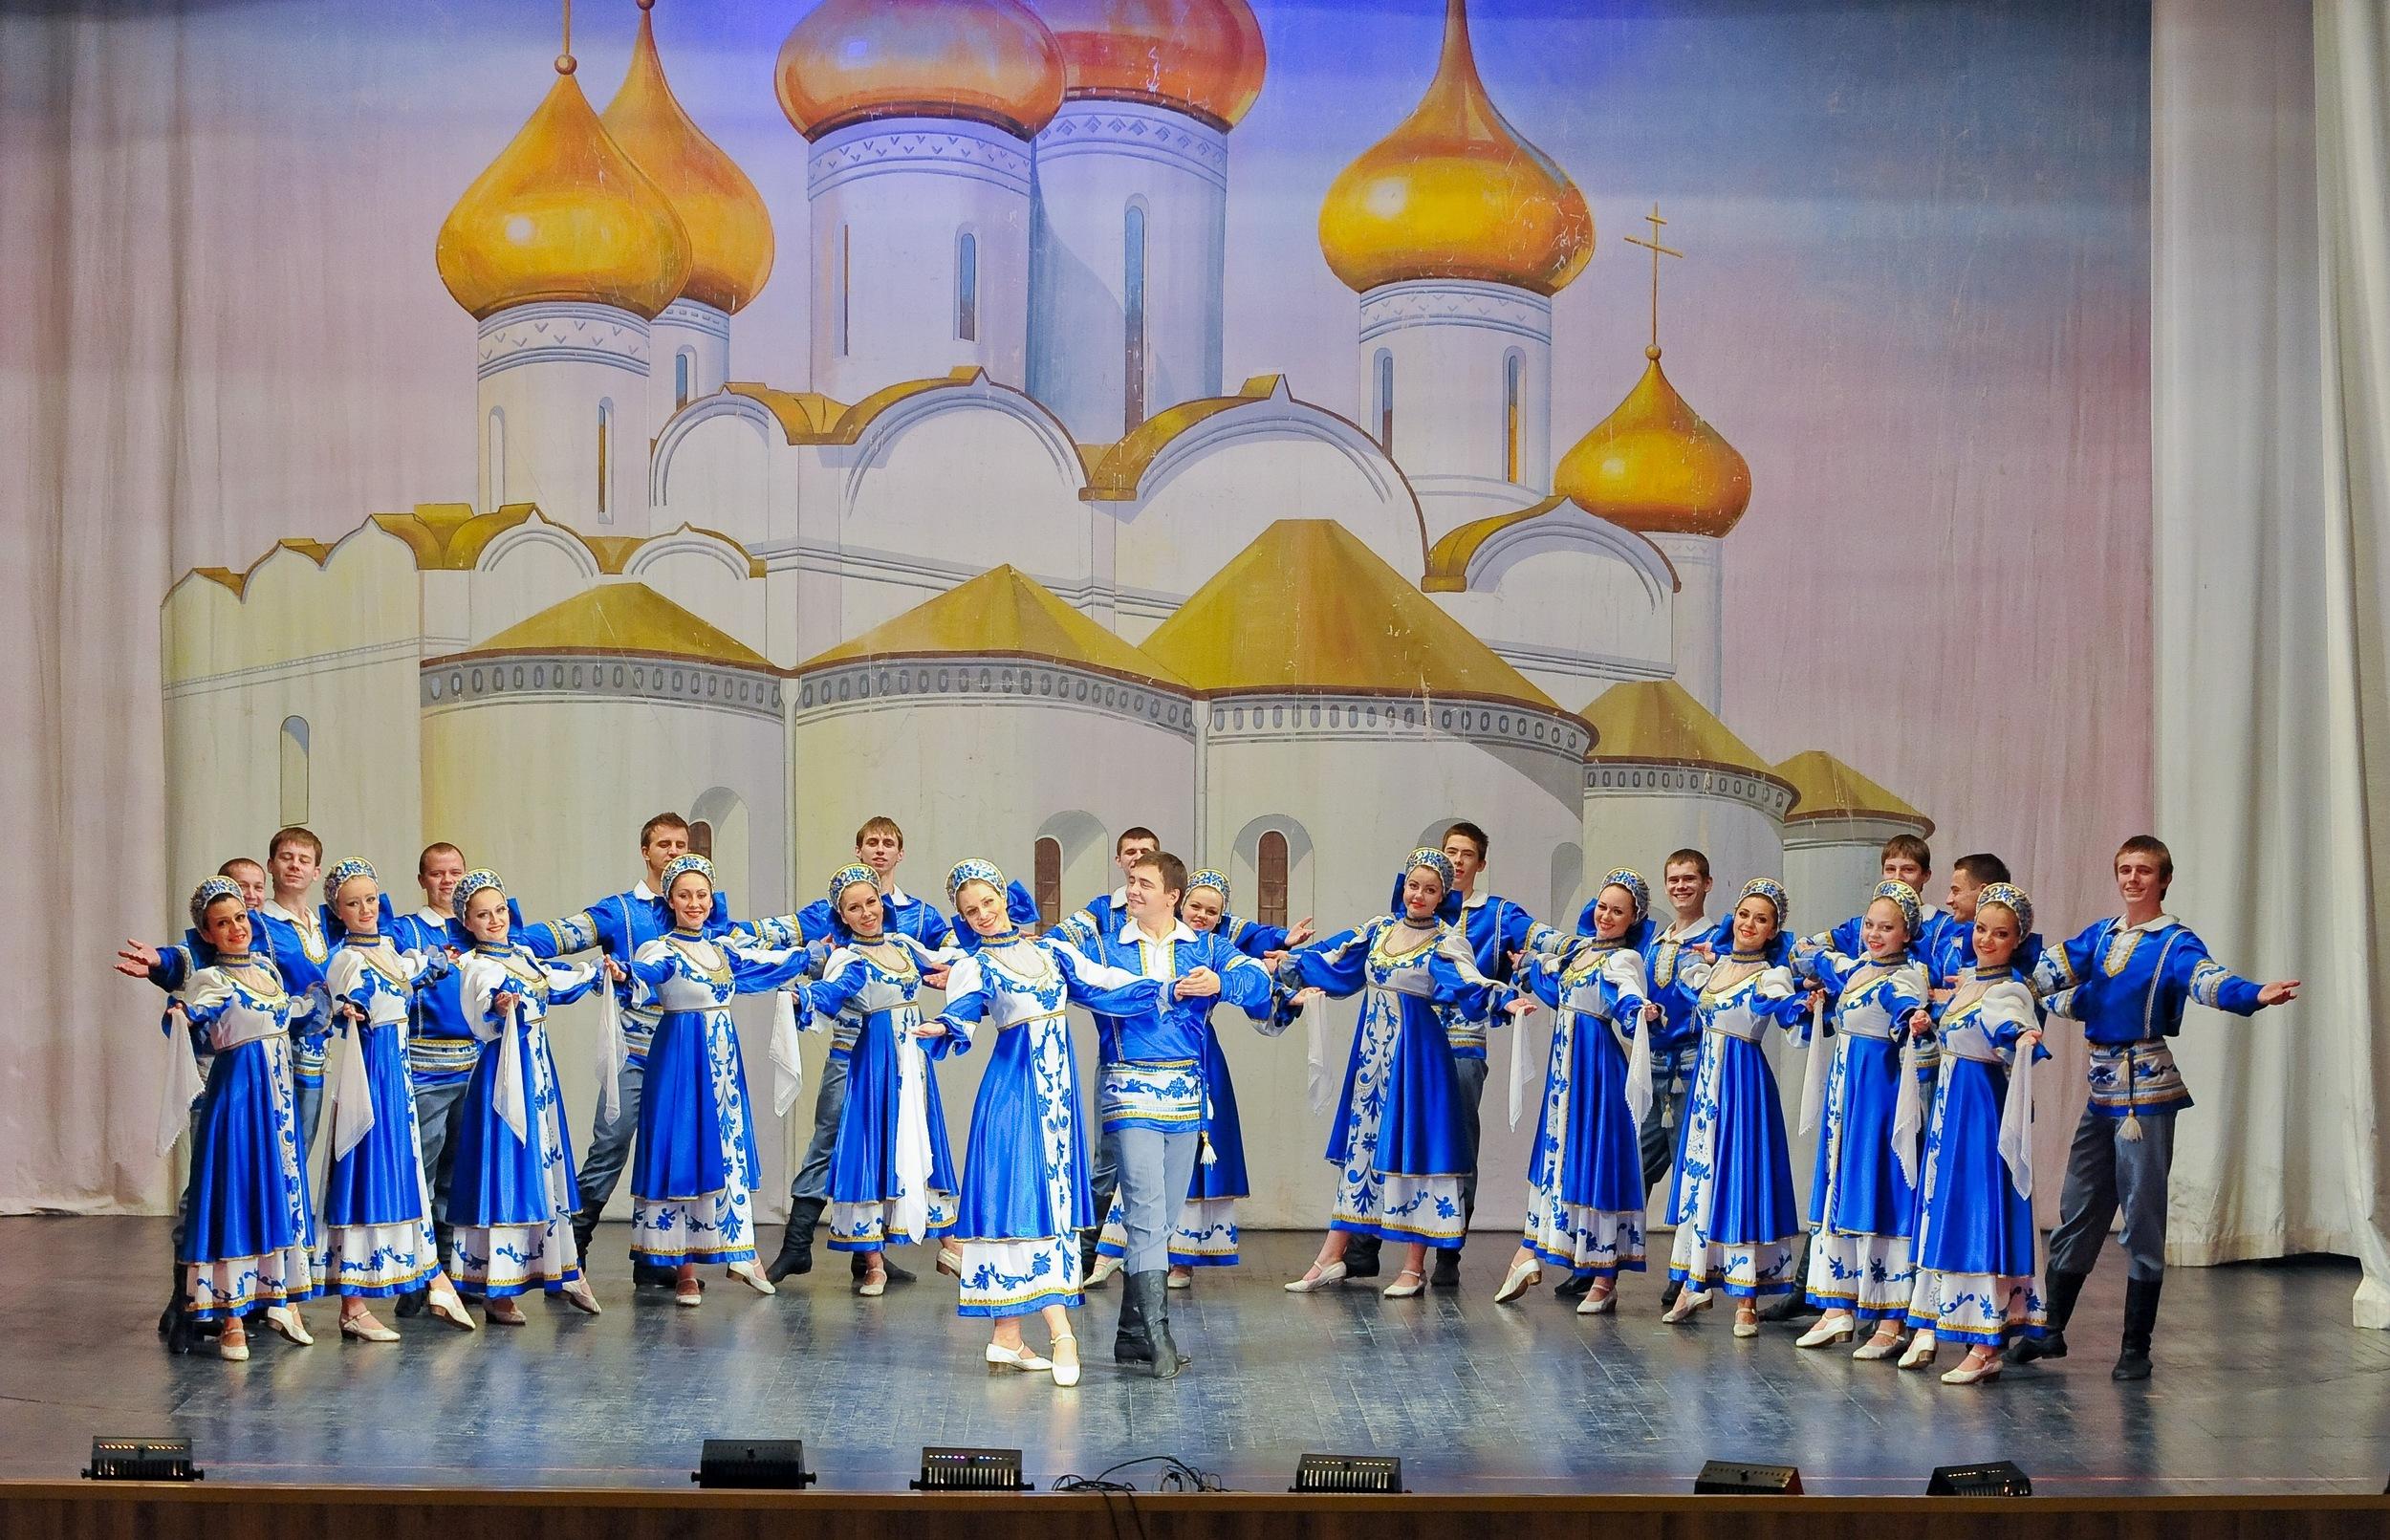 kiralyi_napok_2015_russia_01.jpg